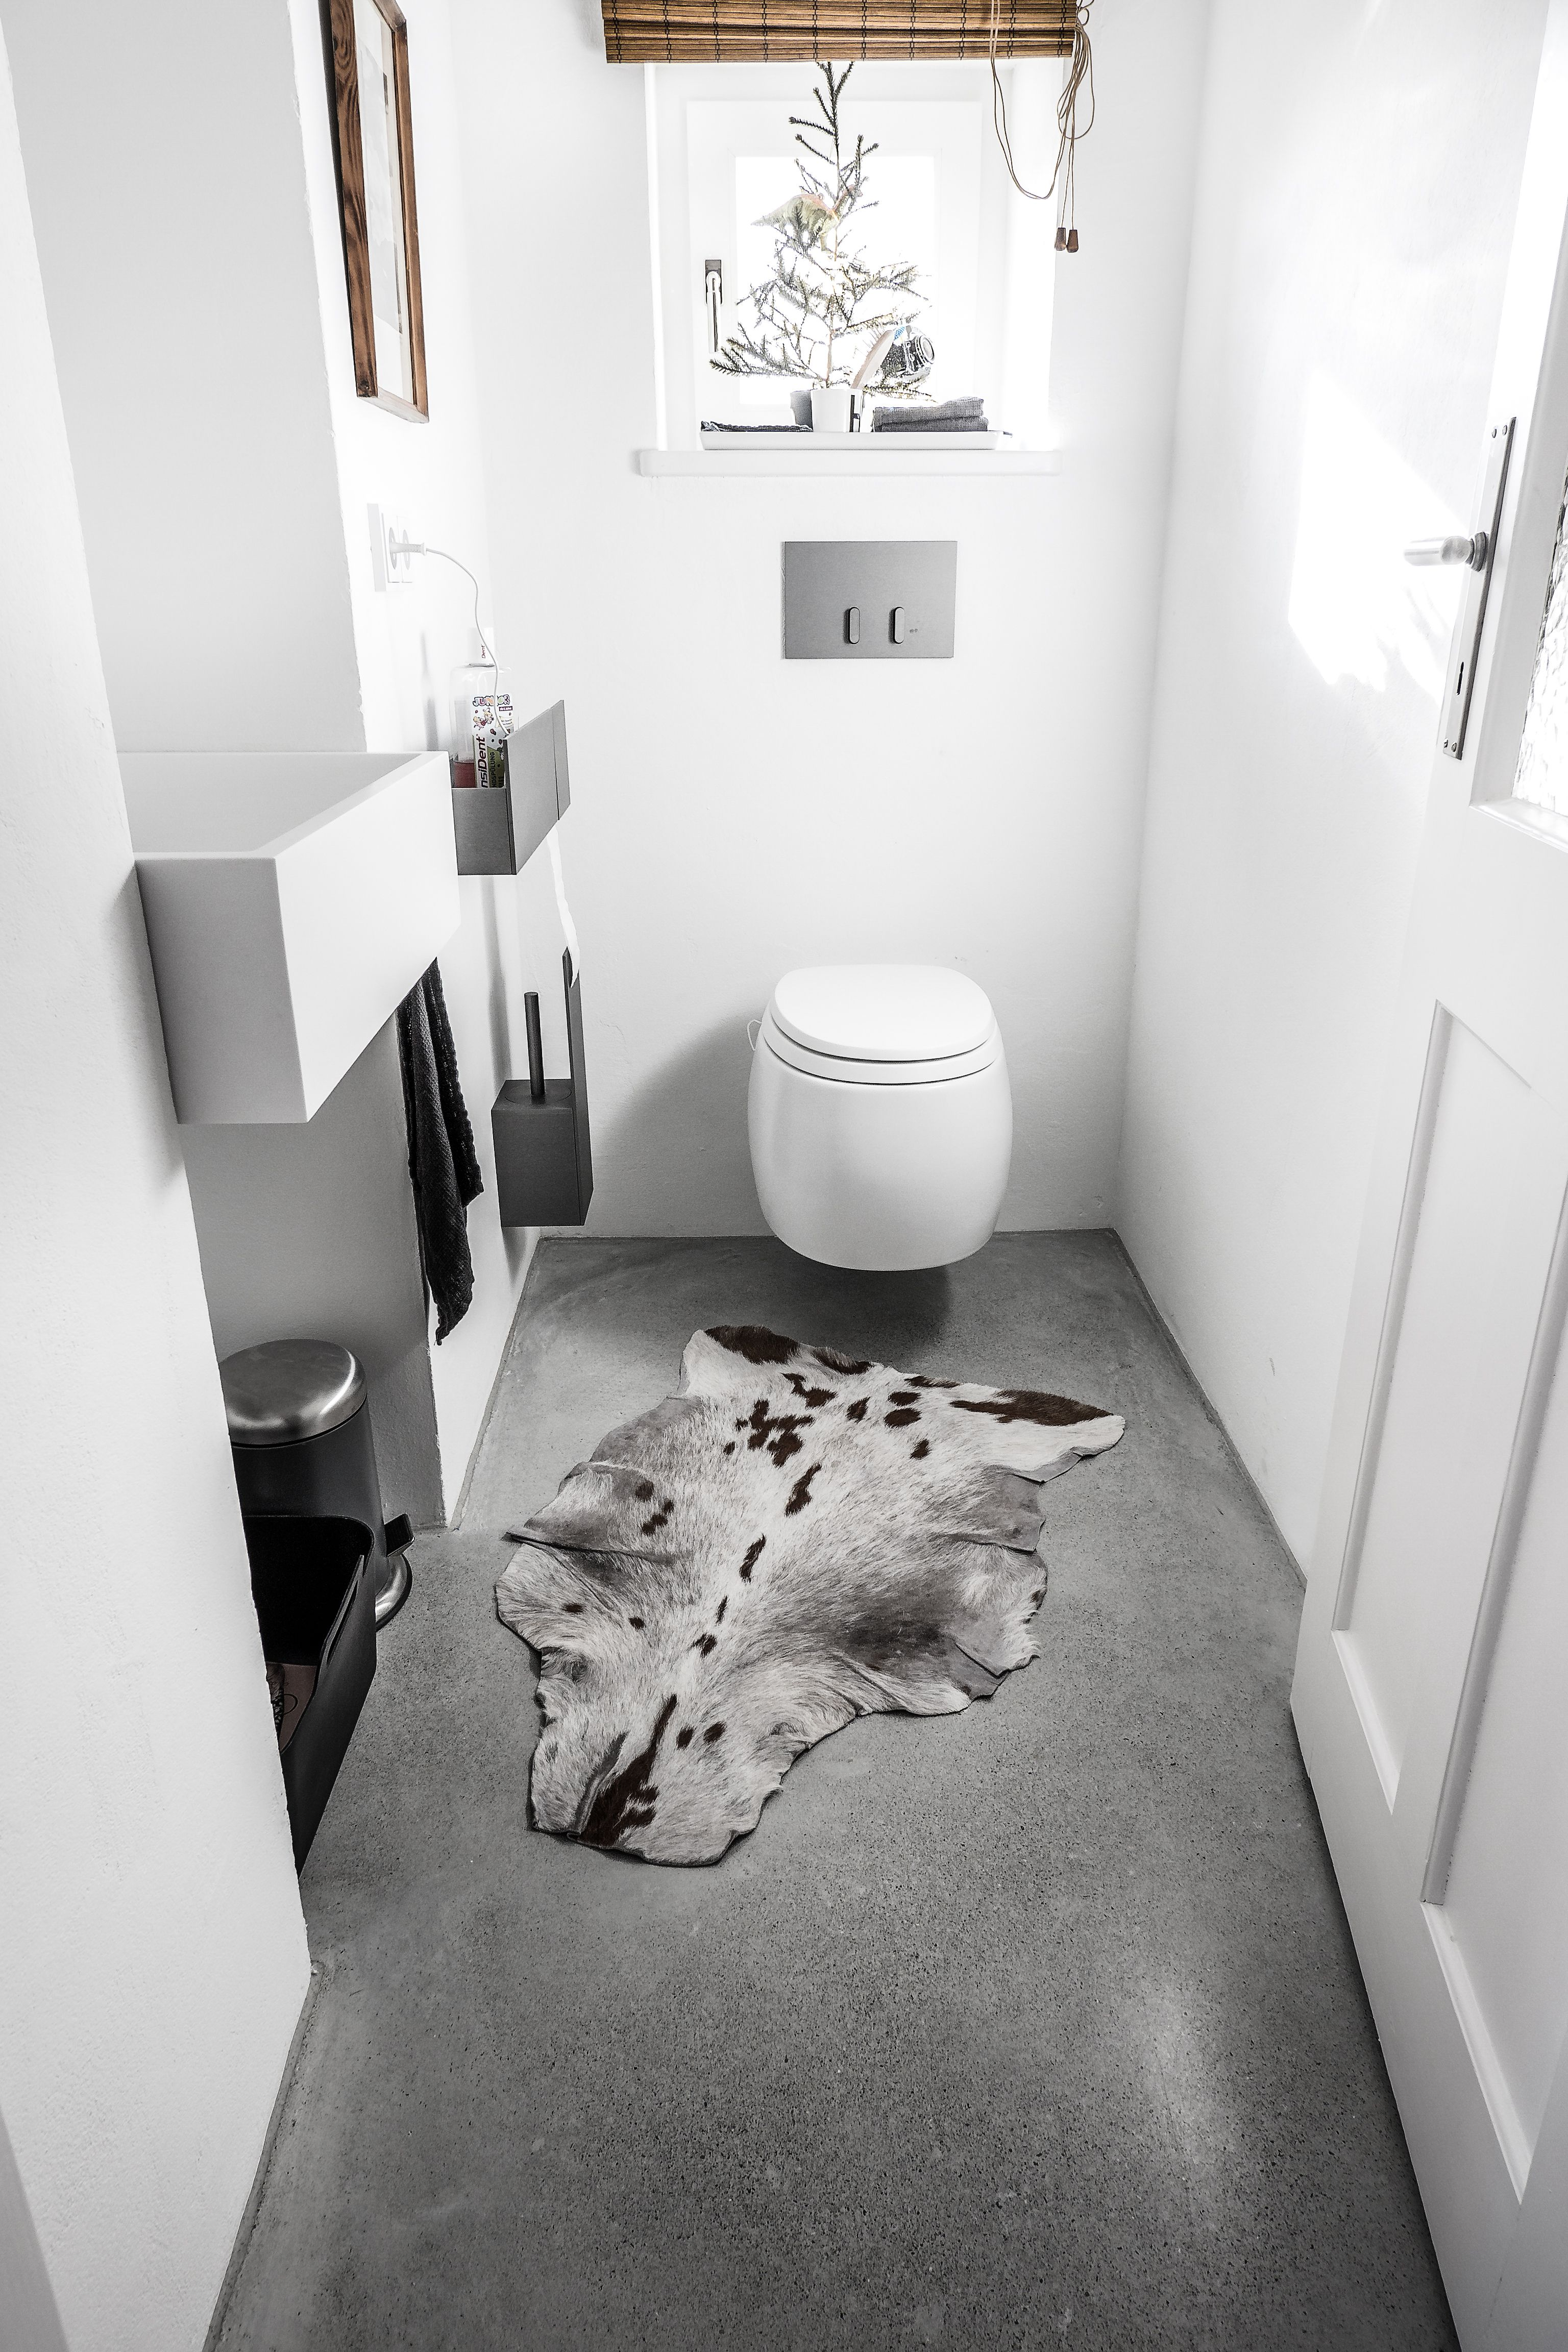 Creafloor Design Estrich Toilette Wc Designboden Sichtestrich Estrich Beton Sichtestrich Estrich Designestrich